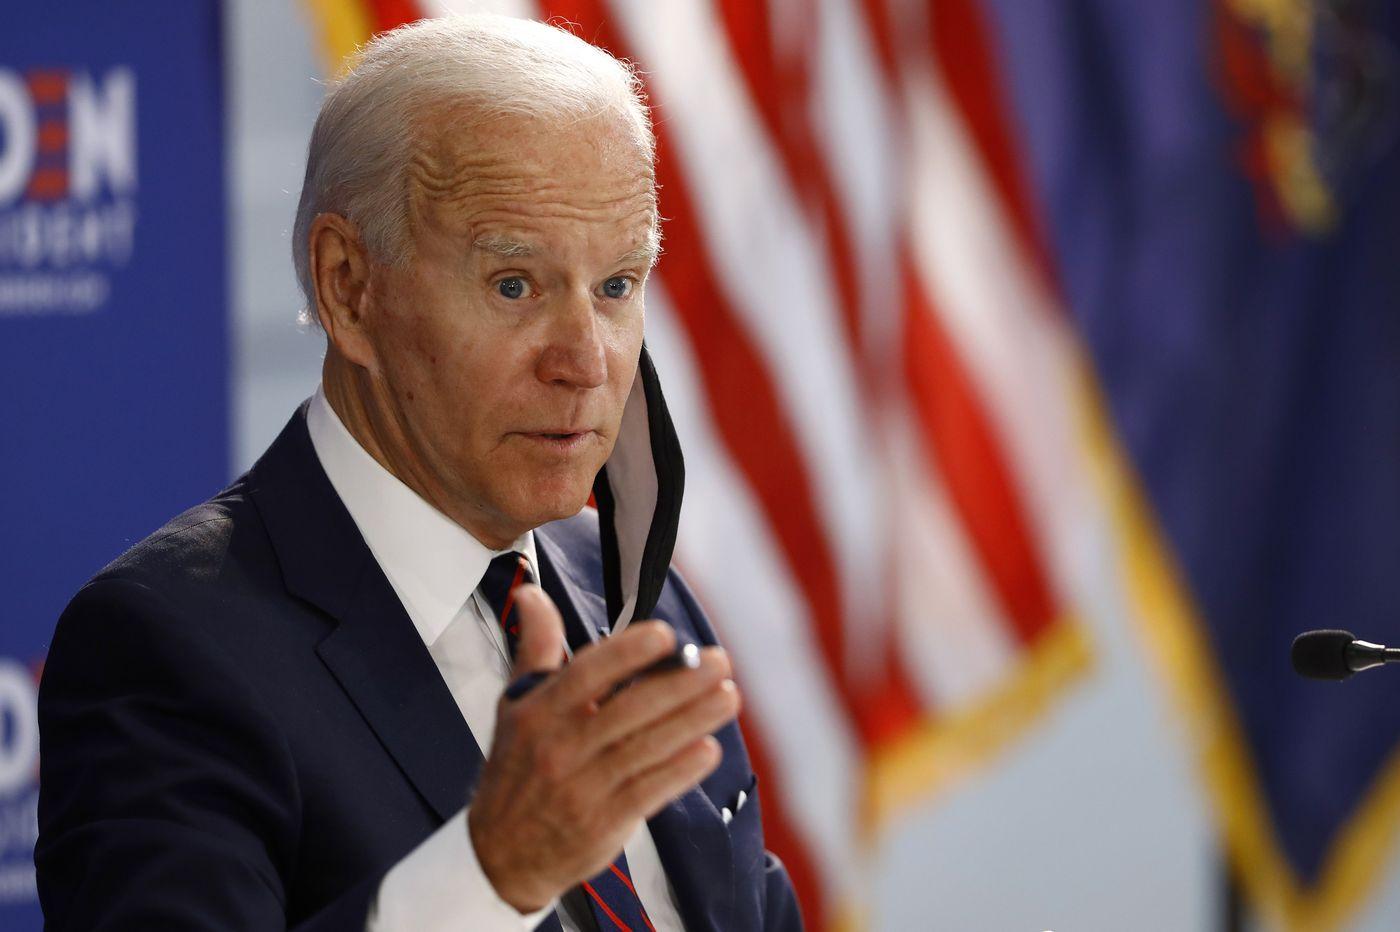 Joe Biden slams Donald Trump over reported Russian bounties placed on U.S. troops in Afghanistan